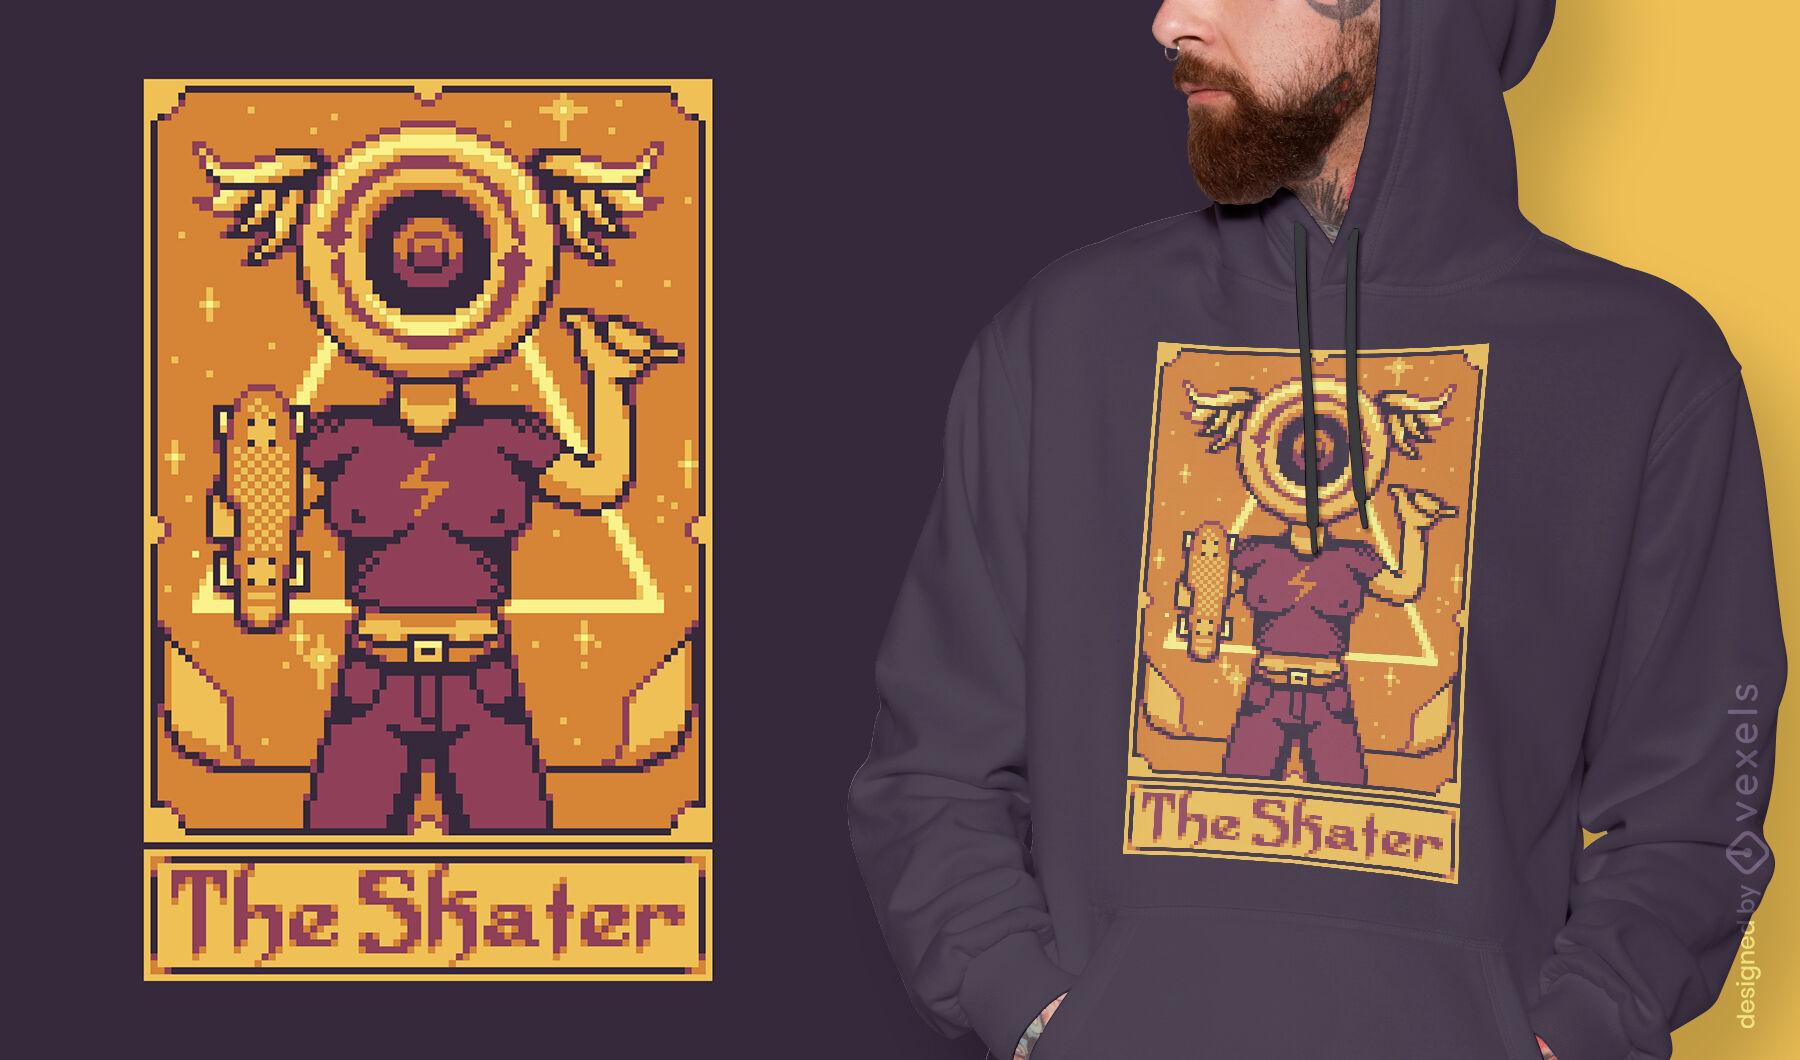 Pixel tarot card skater t-shirt design